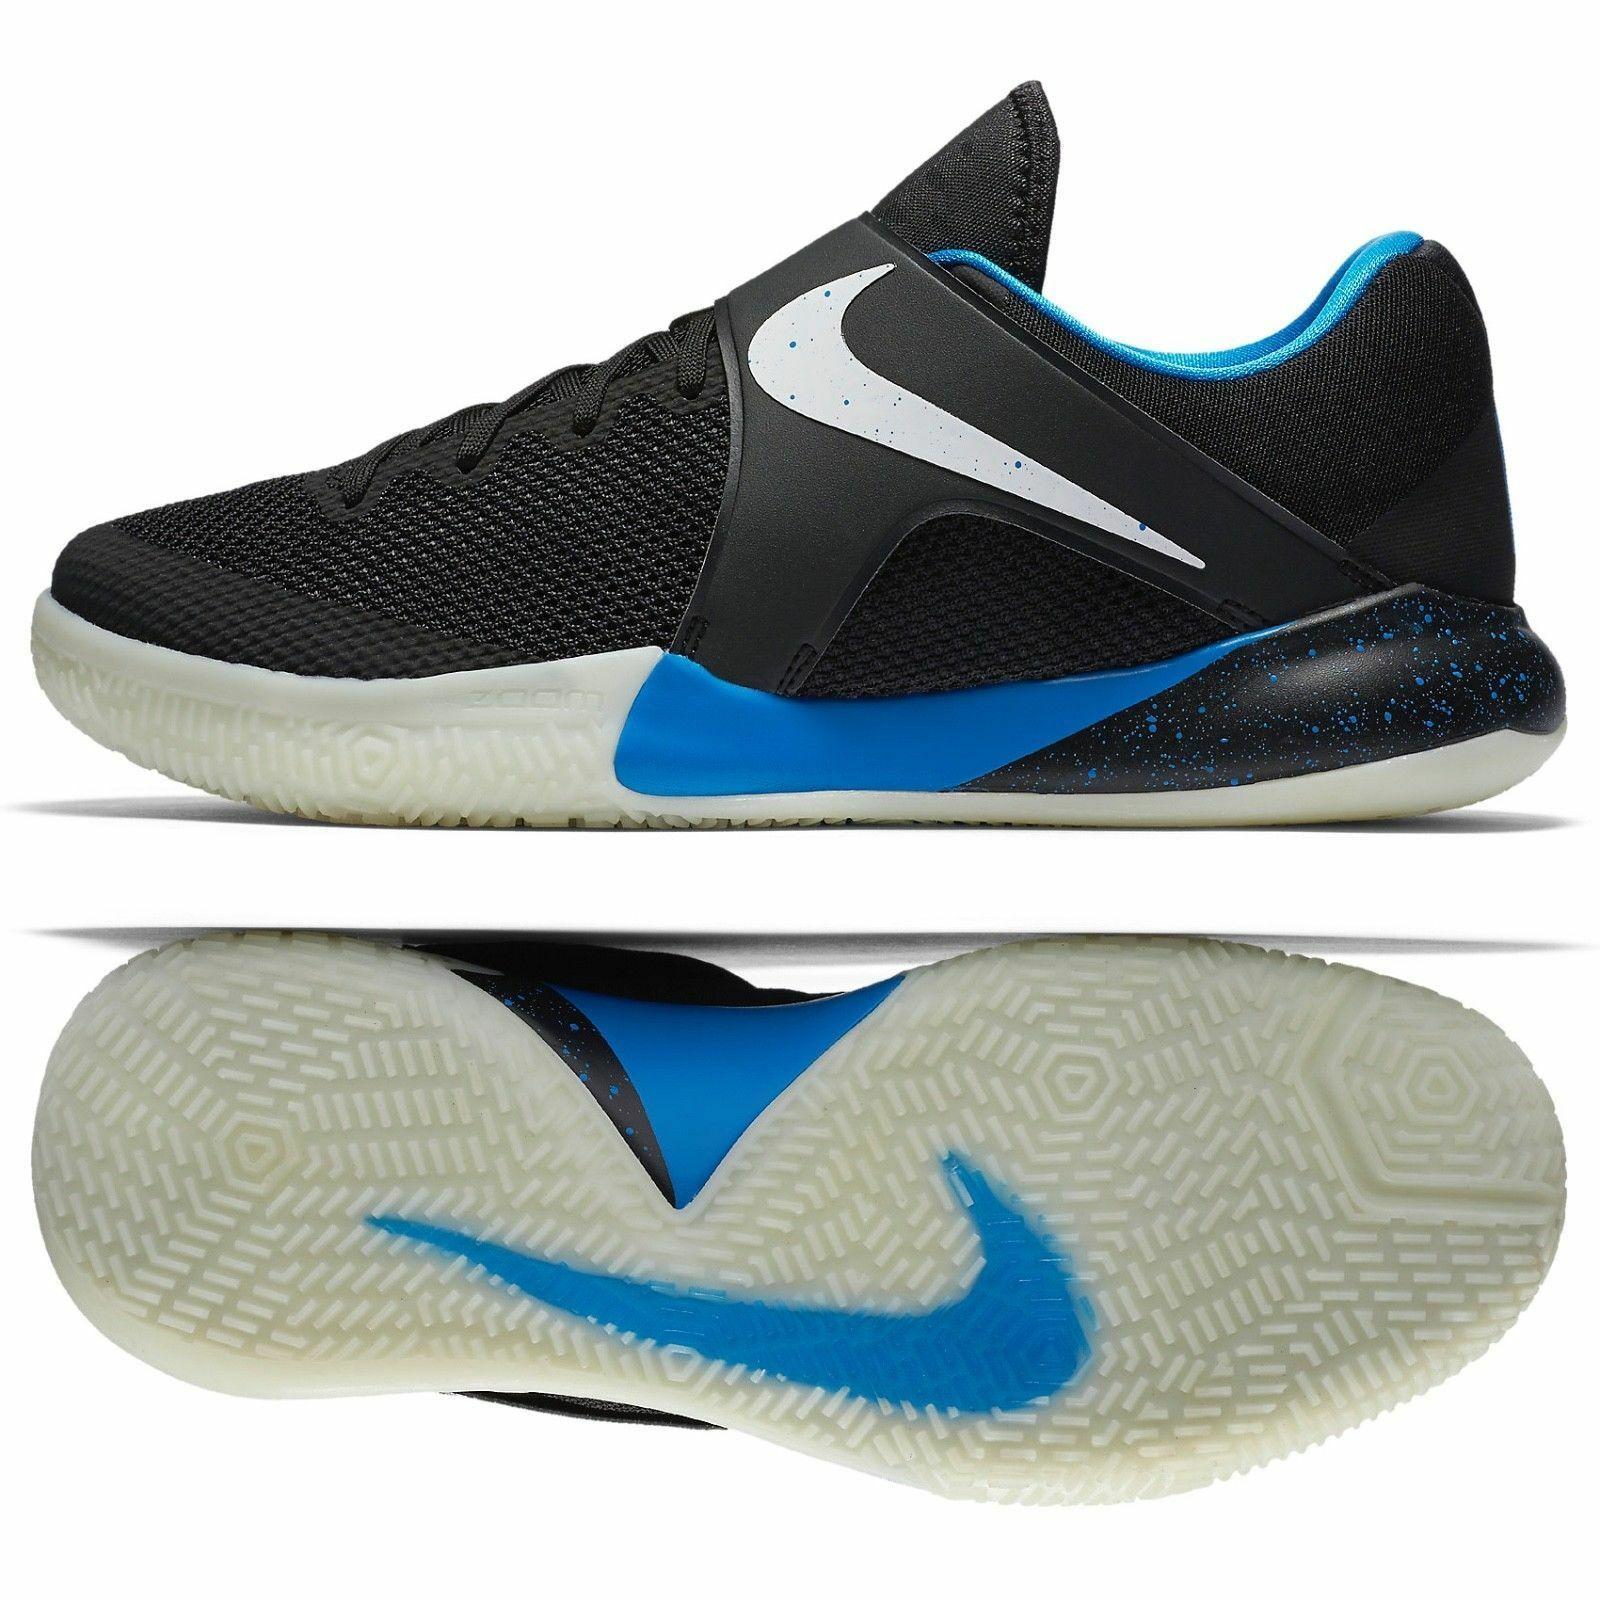 official photos 75034 7aa14 Nike Zoom Live PE ZACH LAVINE 910573-014 Black Blue Men Training Shoes  Sneakers